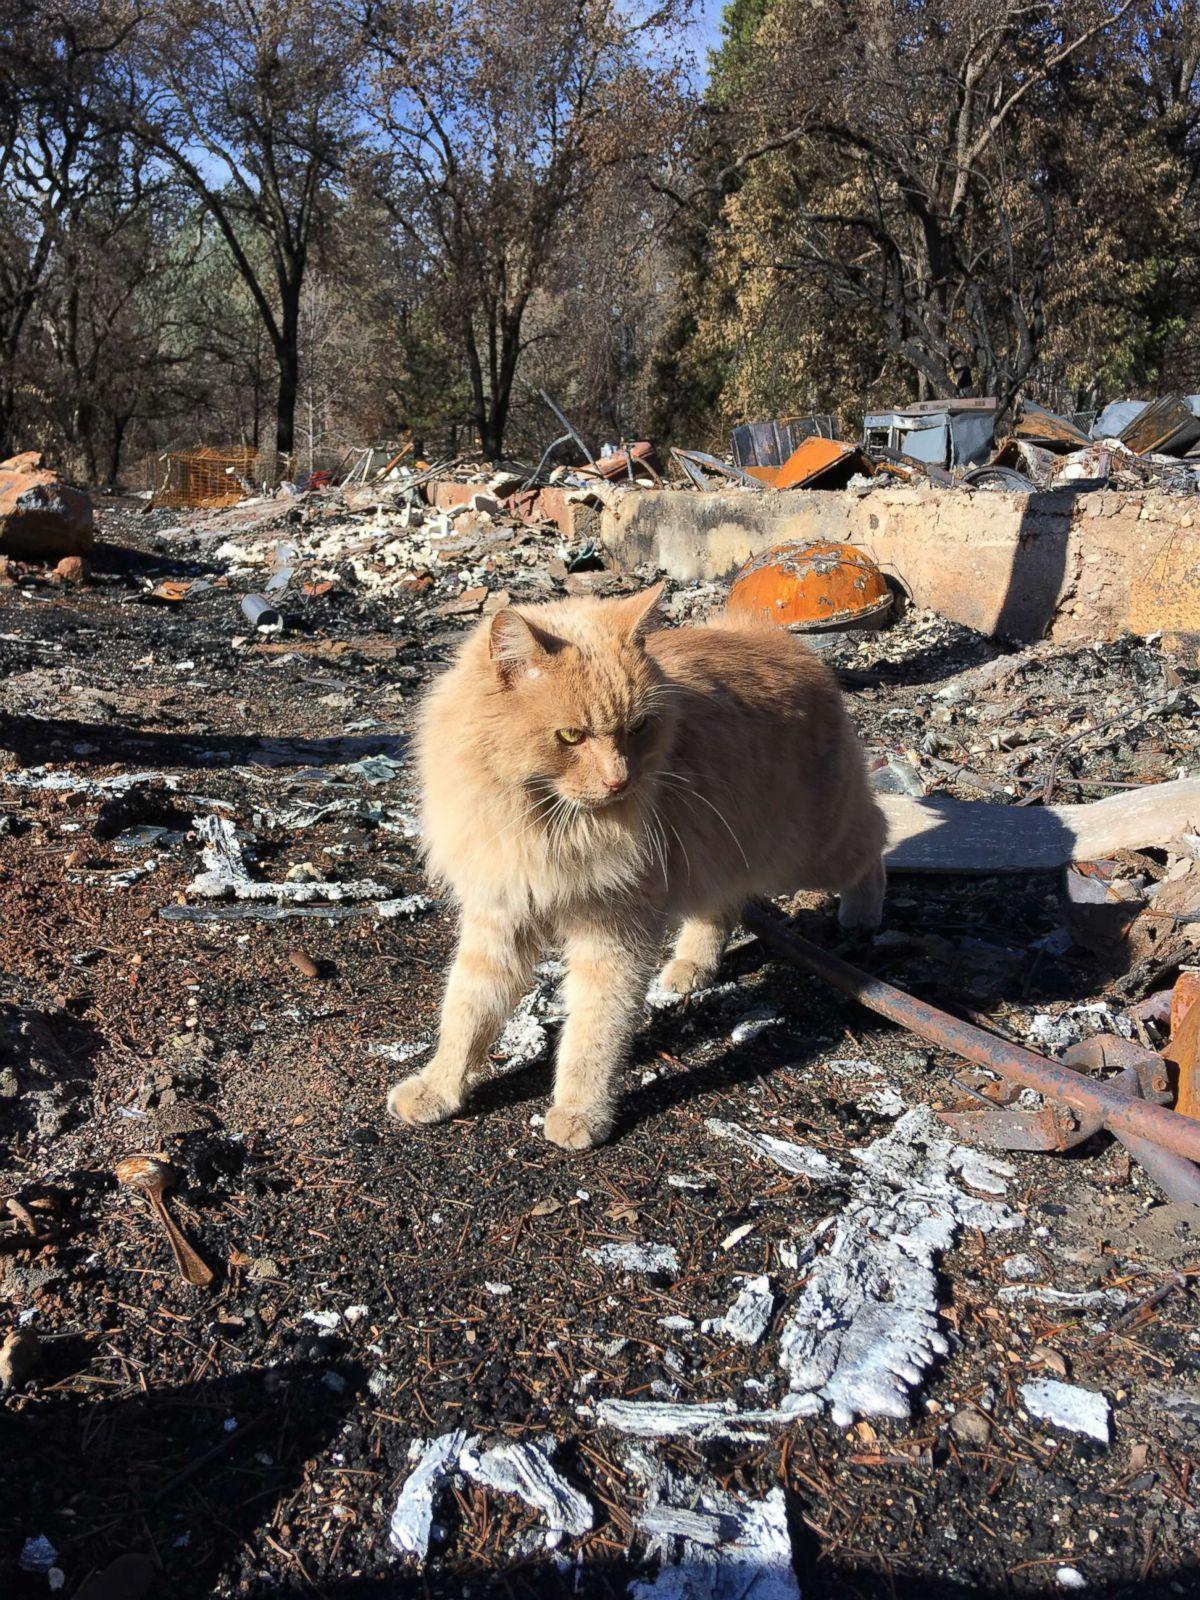 Paradise residents struggle to celebrate holidays after Camp Fire